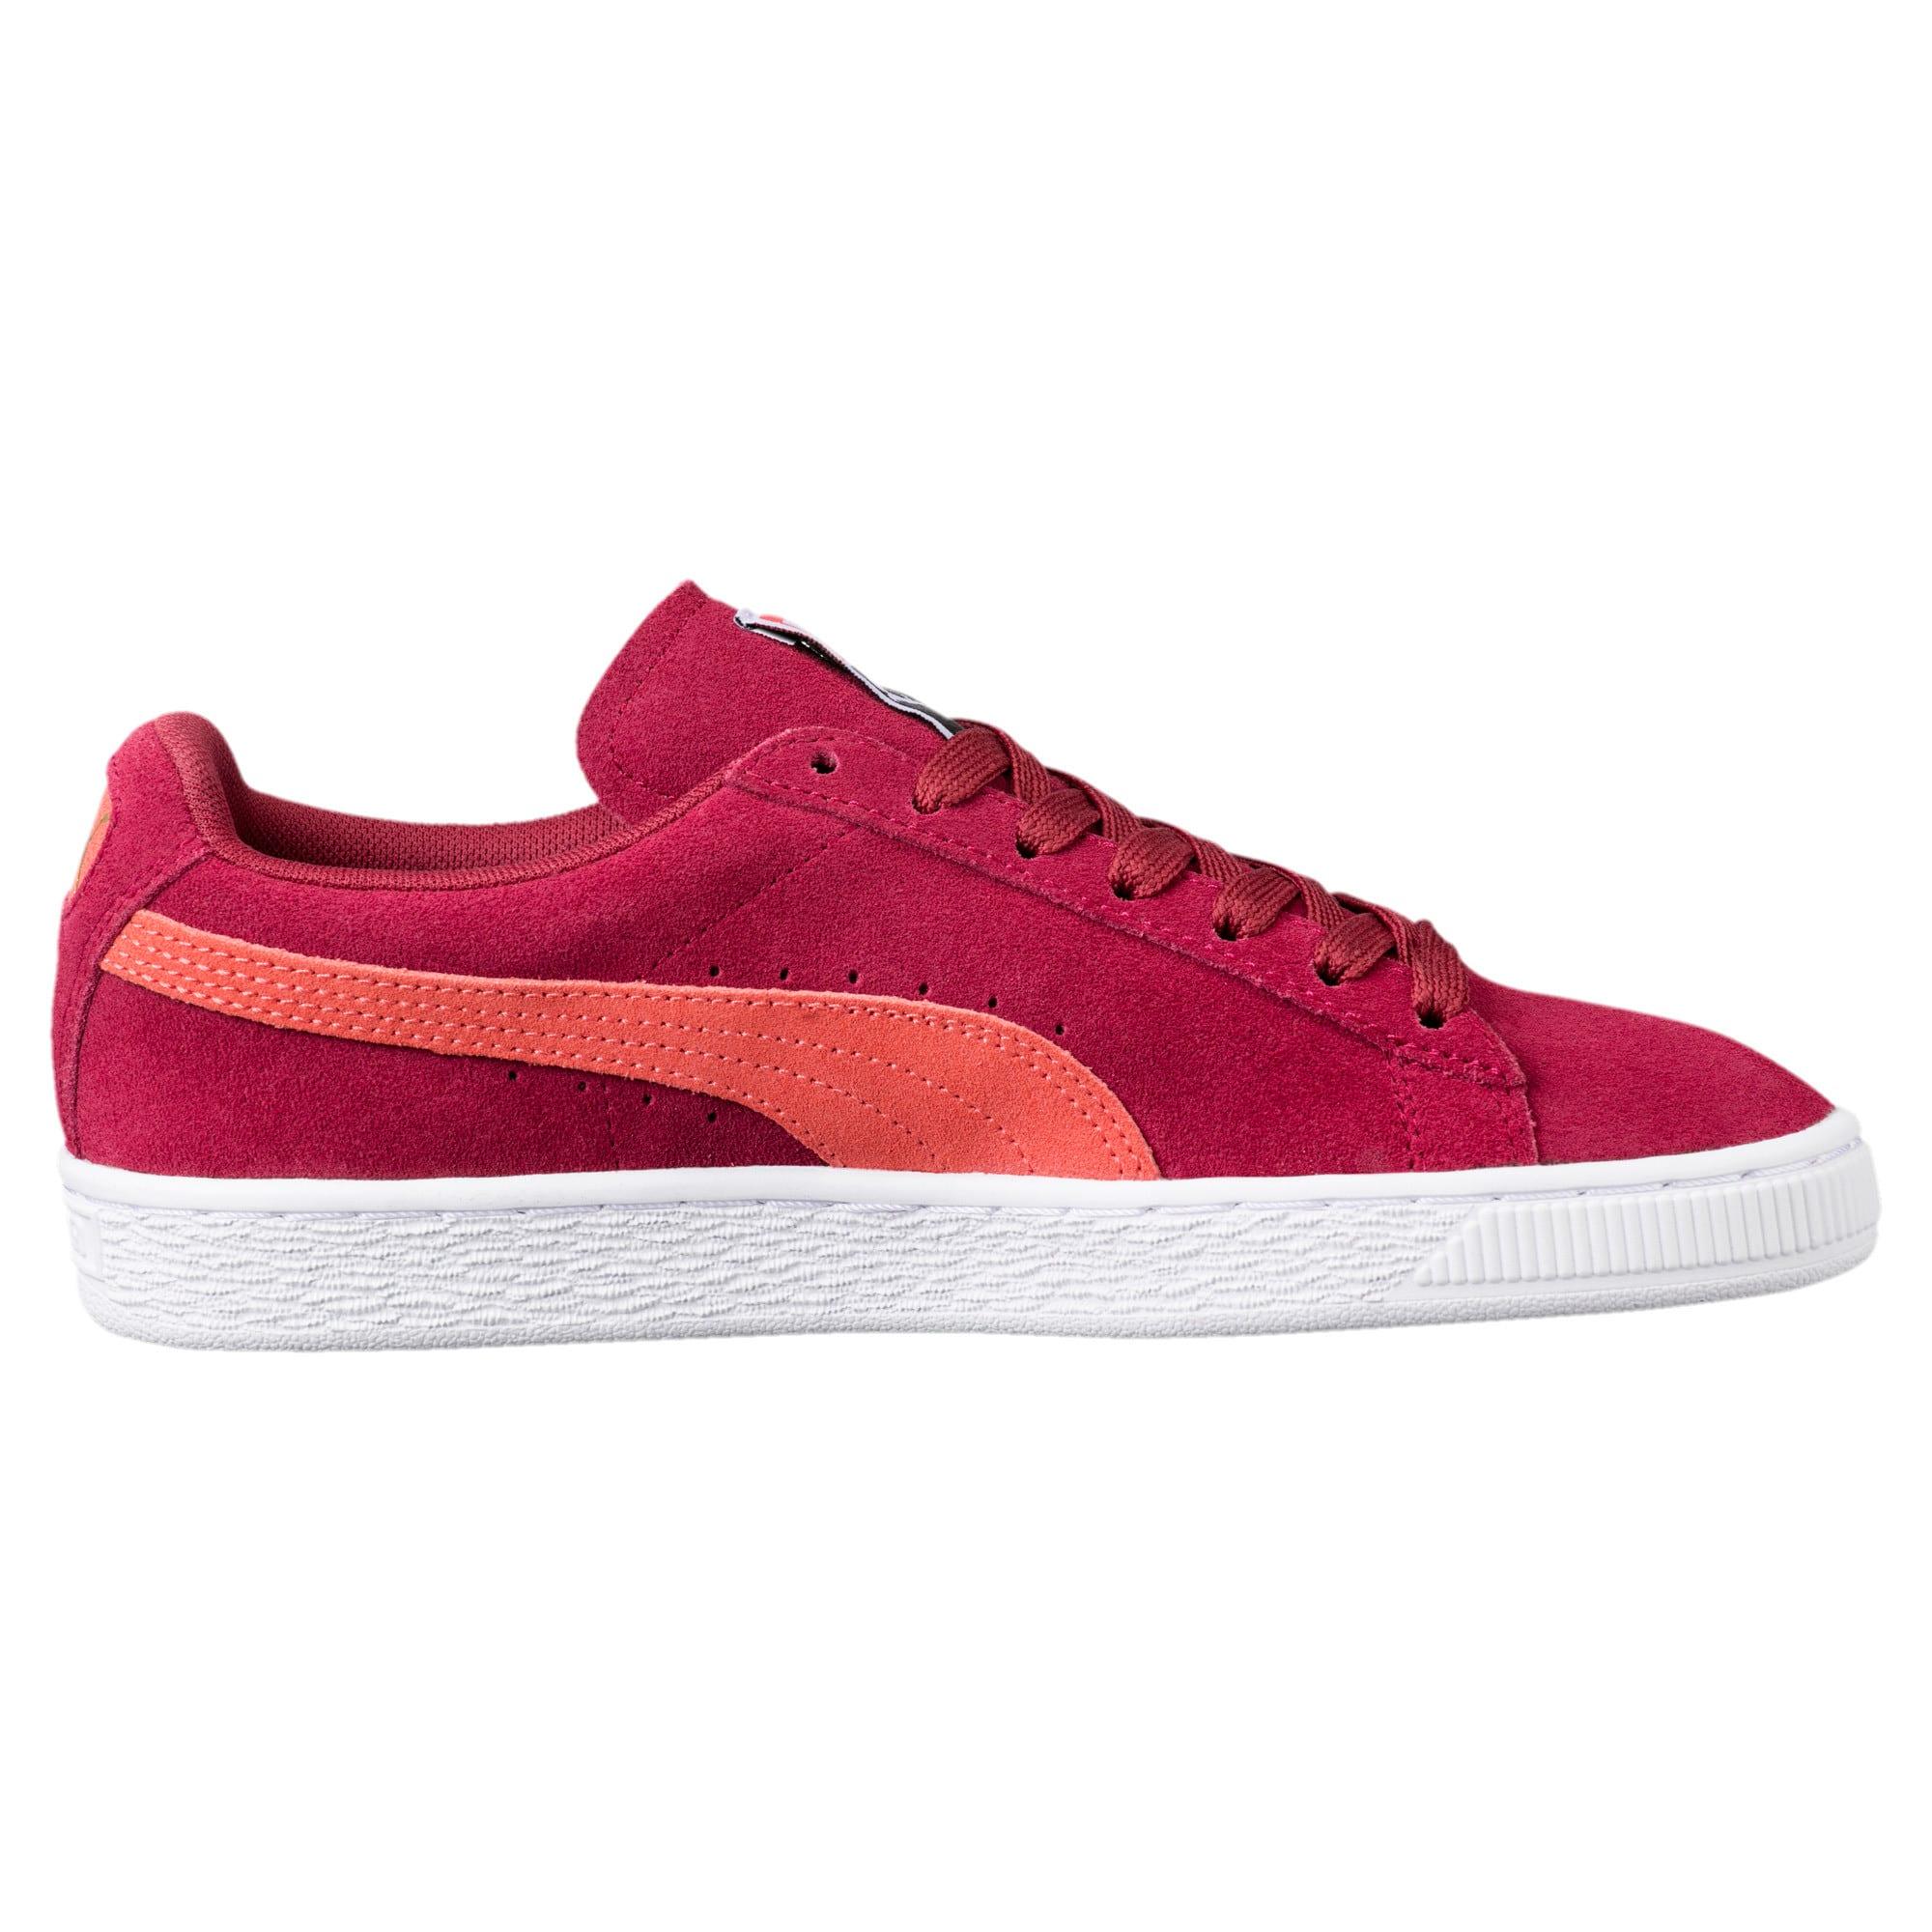 Thumbnail 3 of Suede Classic Women's Sneakers, Tibetan Red-Hot Coral, medium